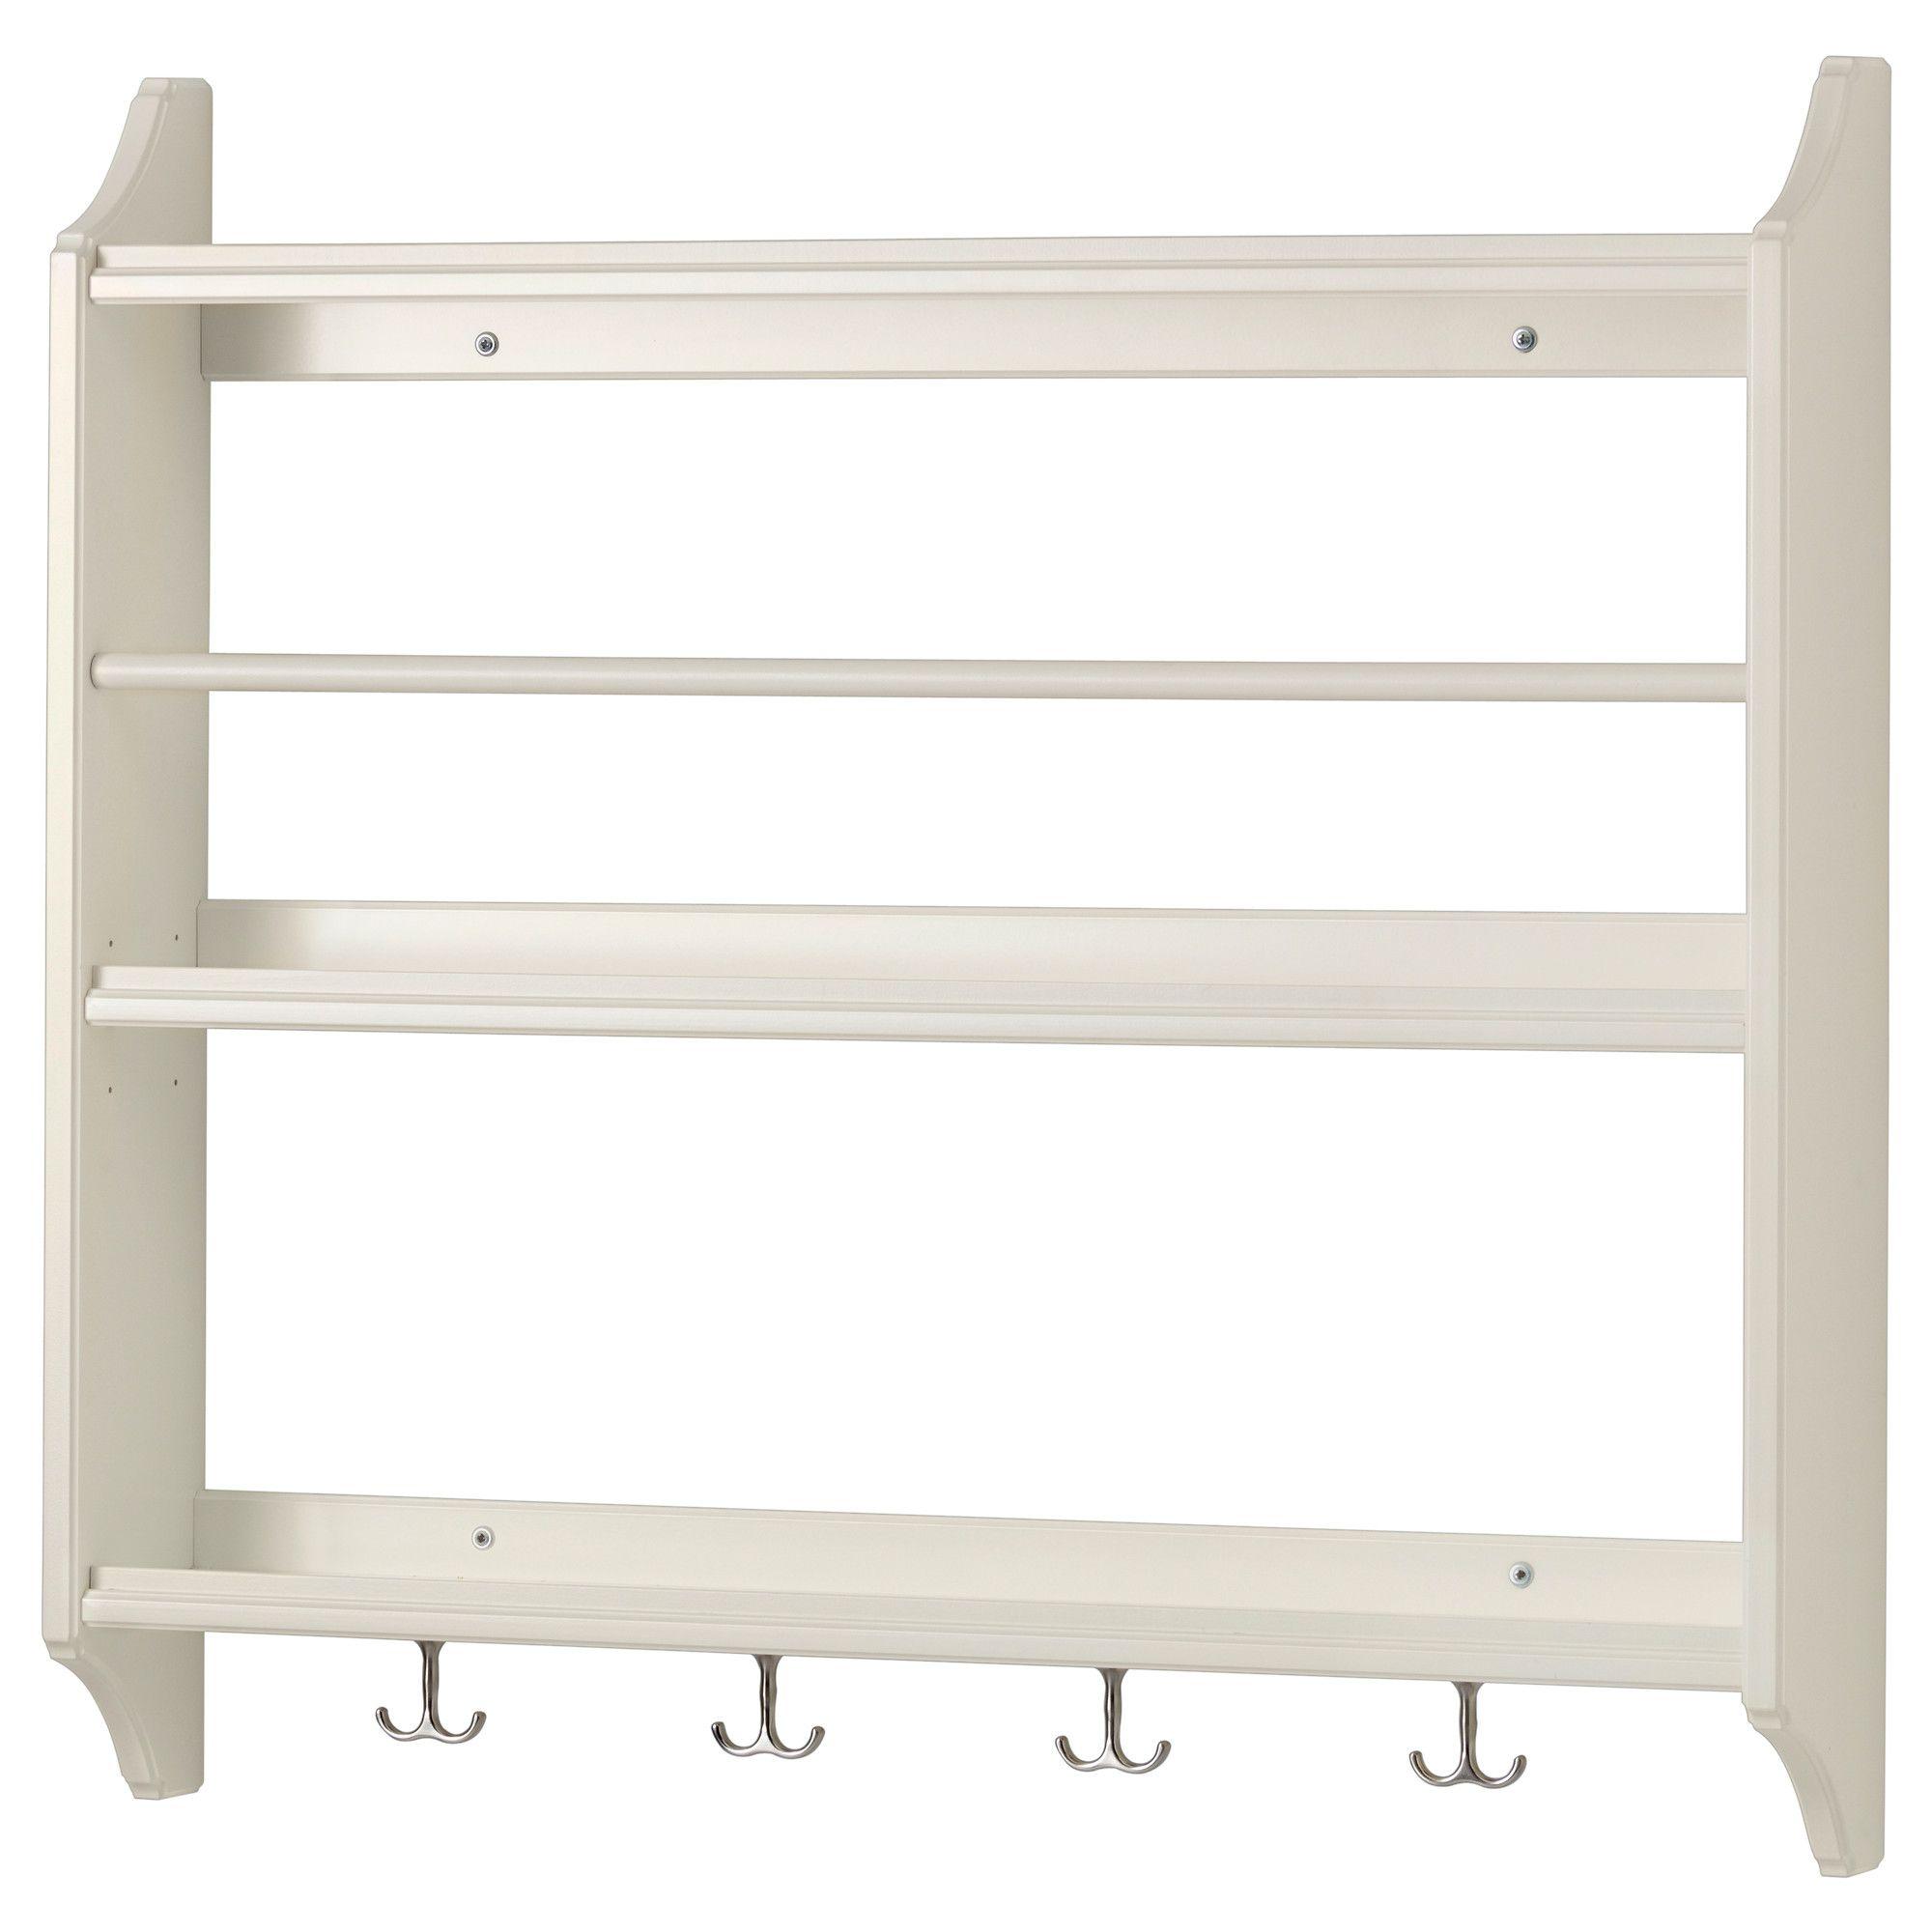 STENSTORP Piattaia - IKEA- parete piccola,verifica misure   CUCINA ...